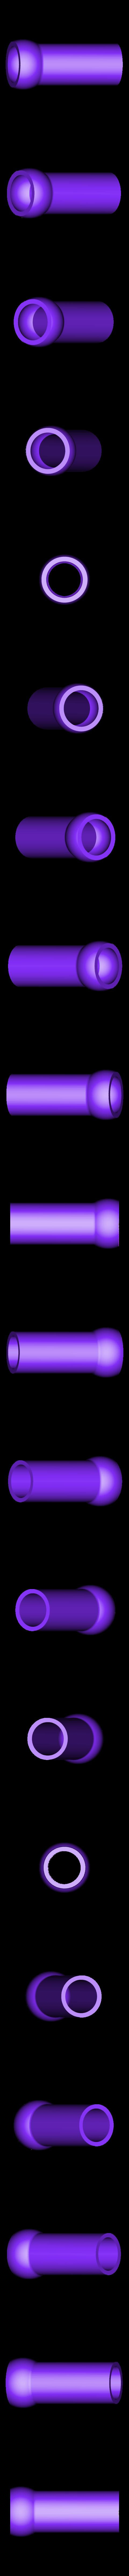 Stoker_Pipe_1.STL Download free STL file 4-8-8-4 Big Boy Locomotive • 3D printer object, RaymondDeLuca